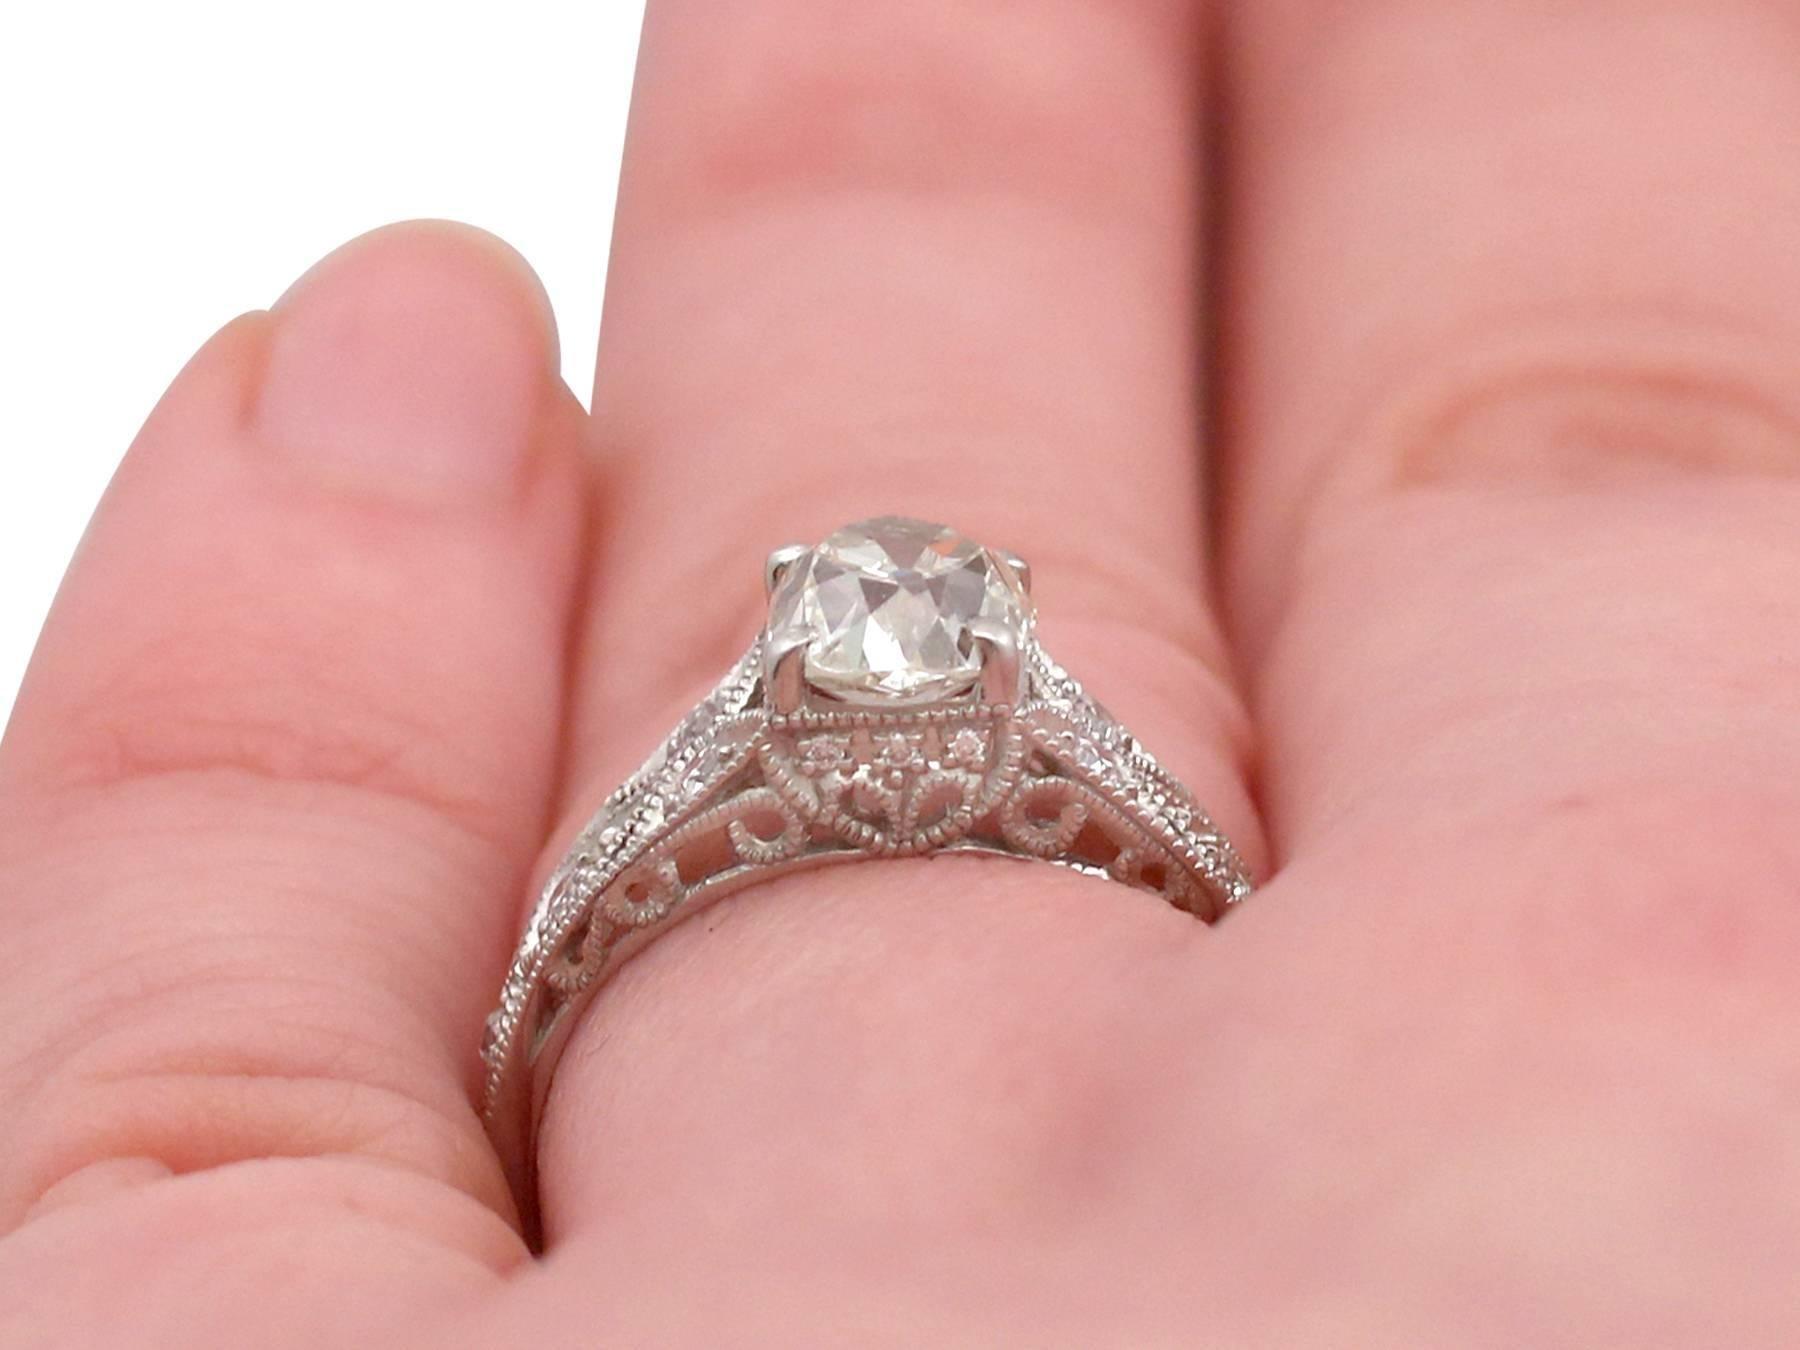 1900s 1.18 Carat Diamond and Contemporary Platinum Solitaire Ring ...